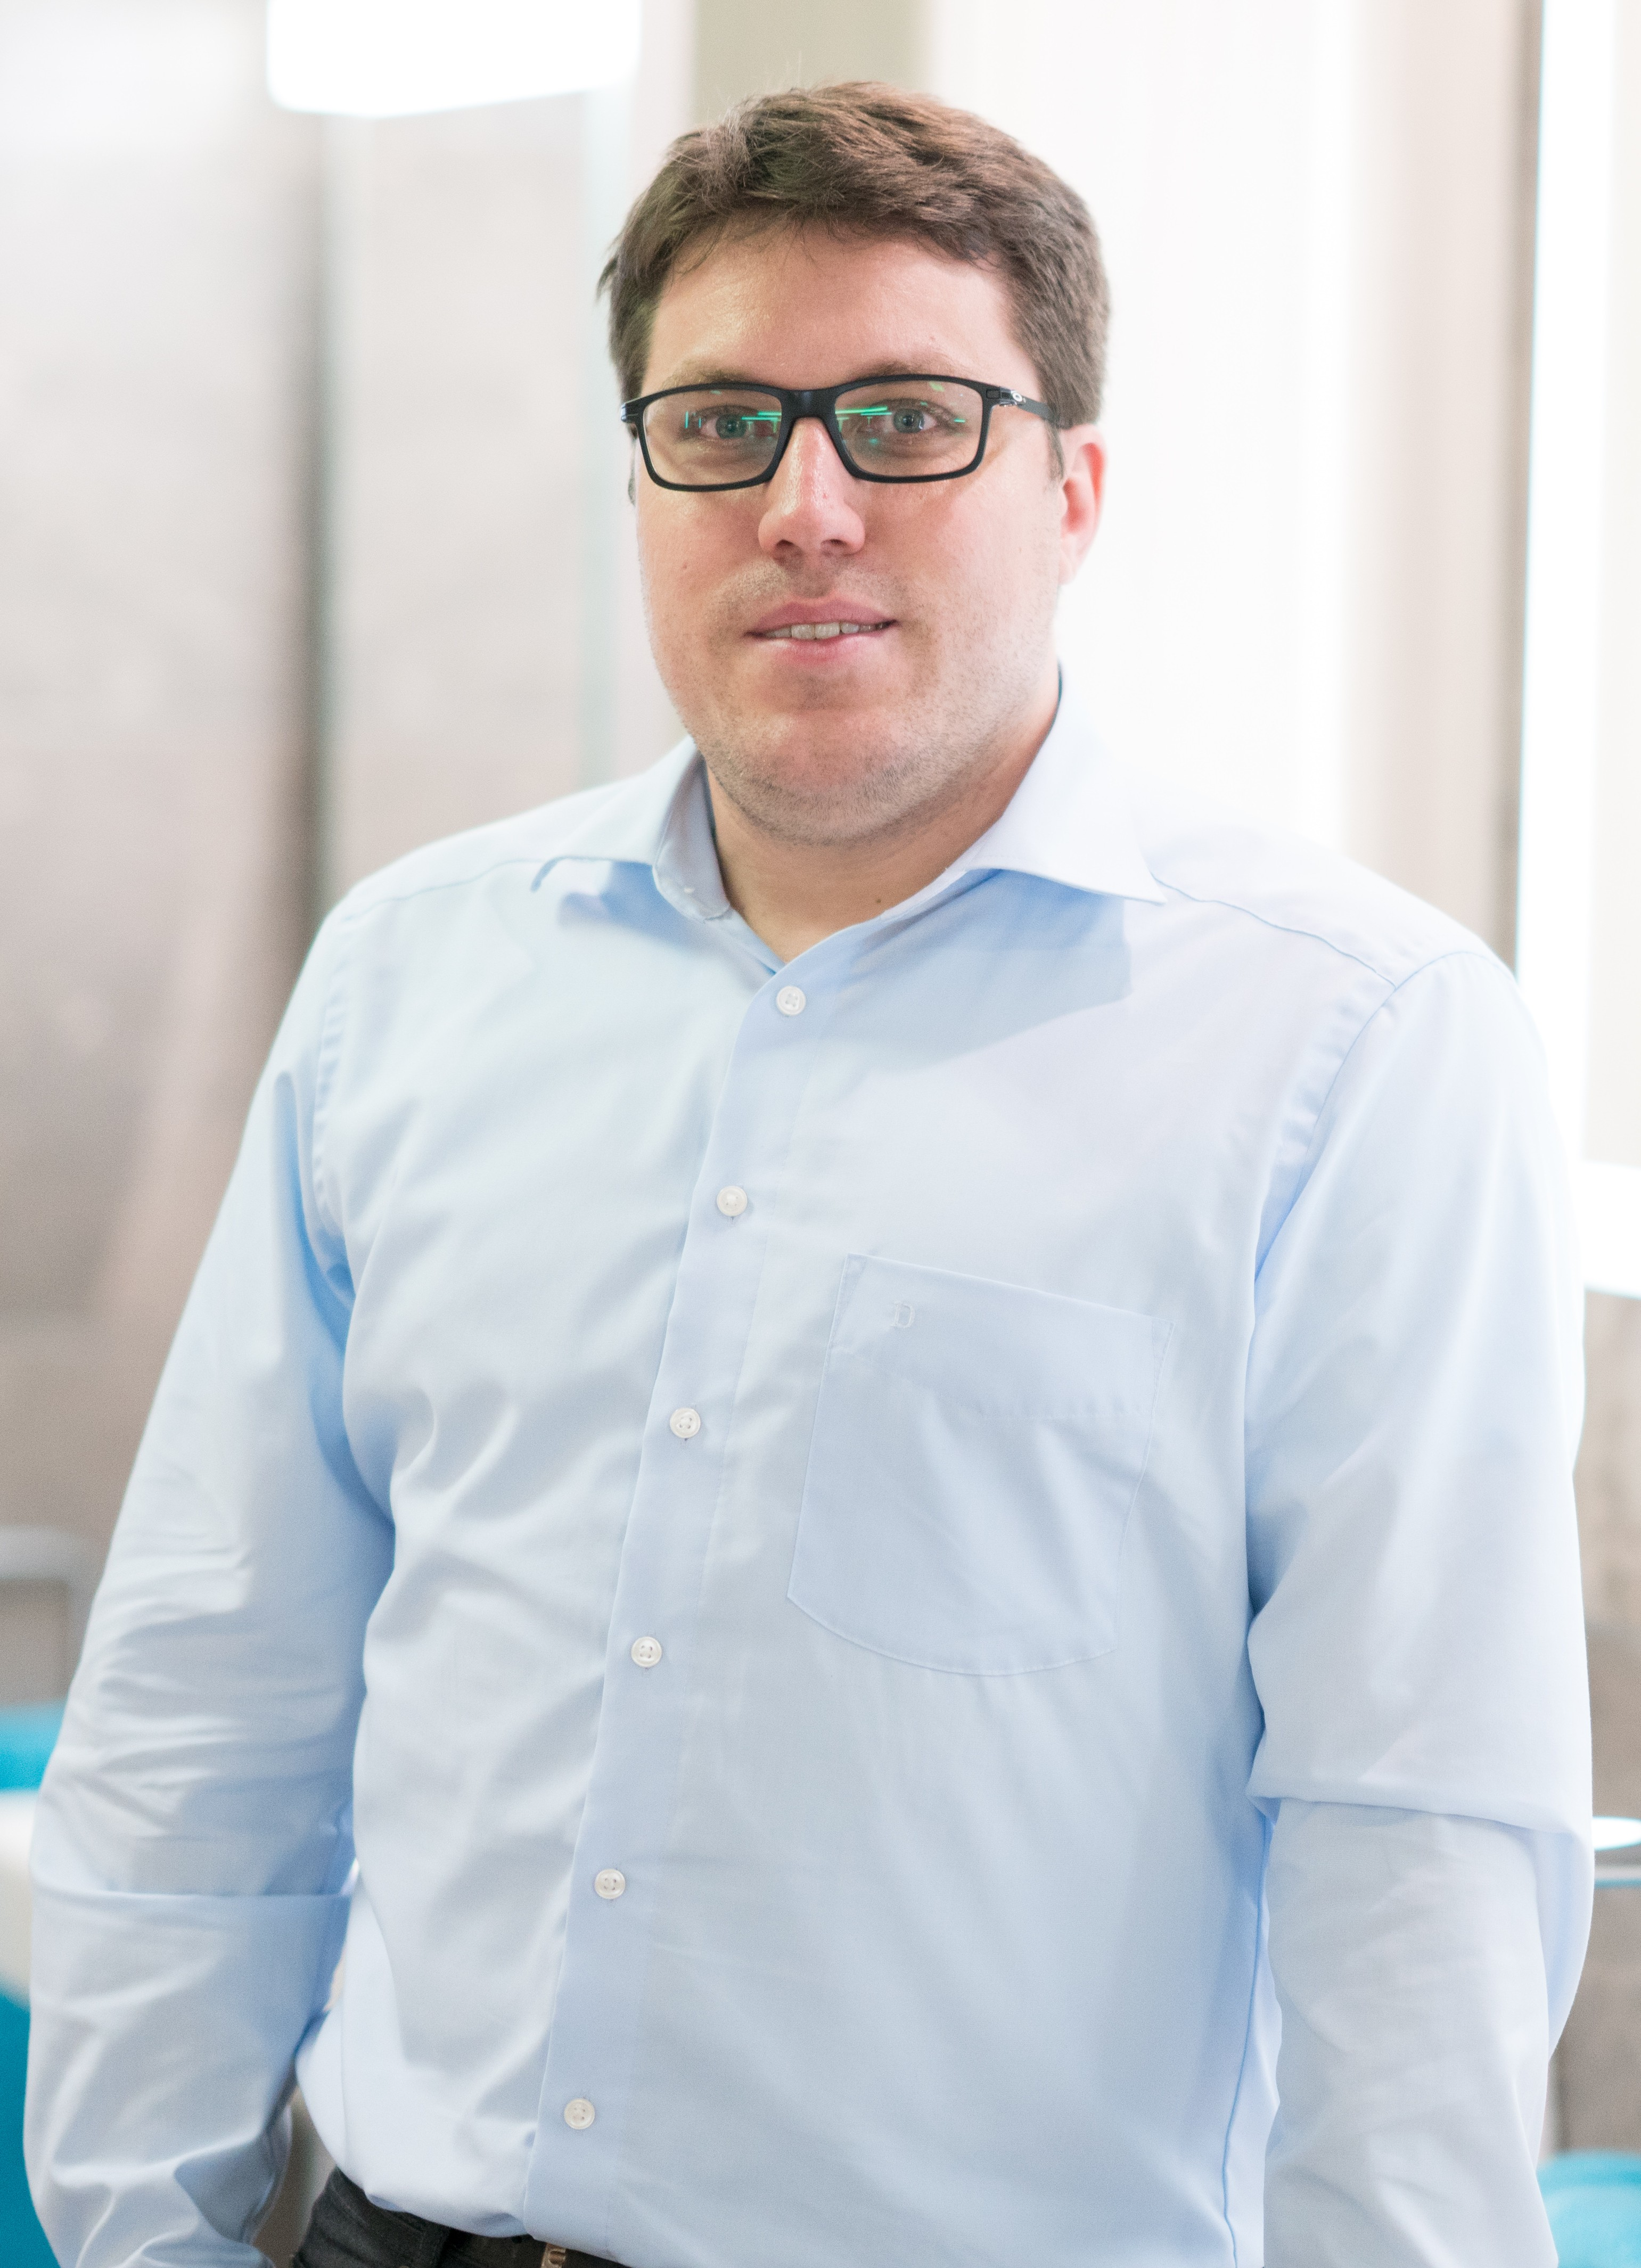 Markus Schindele